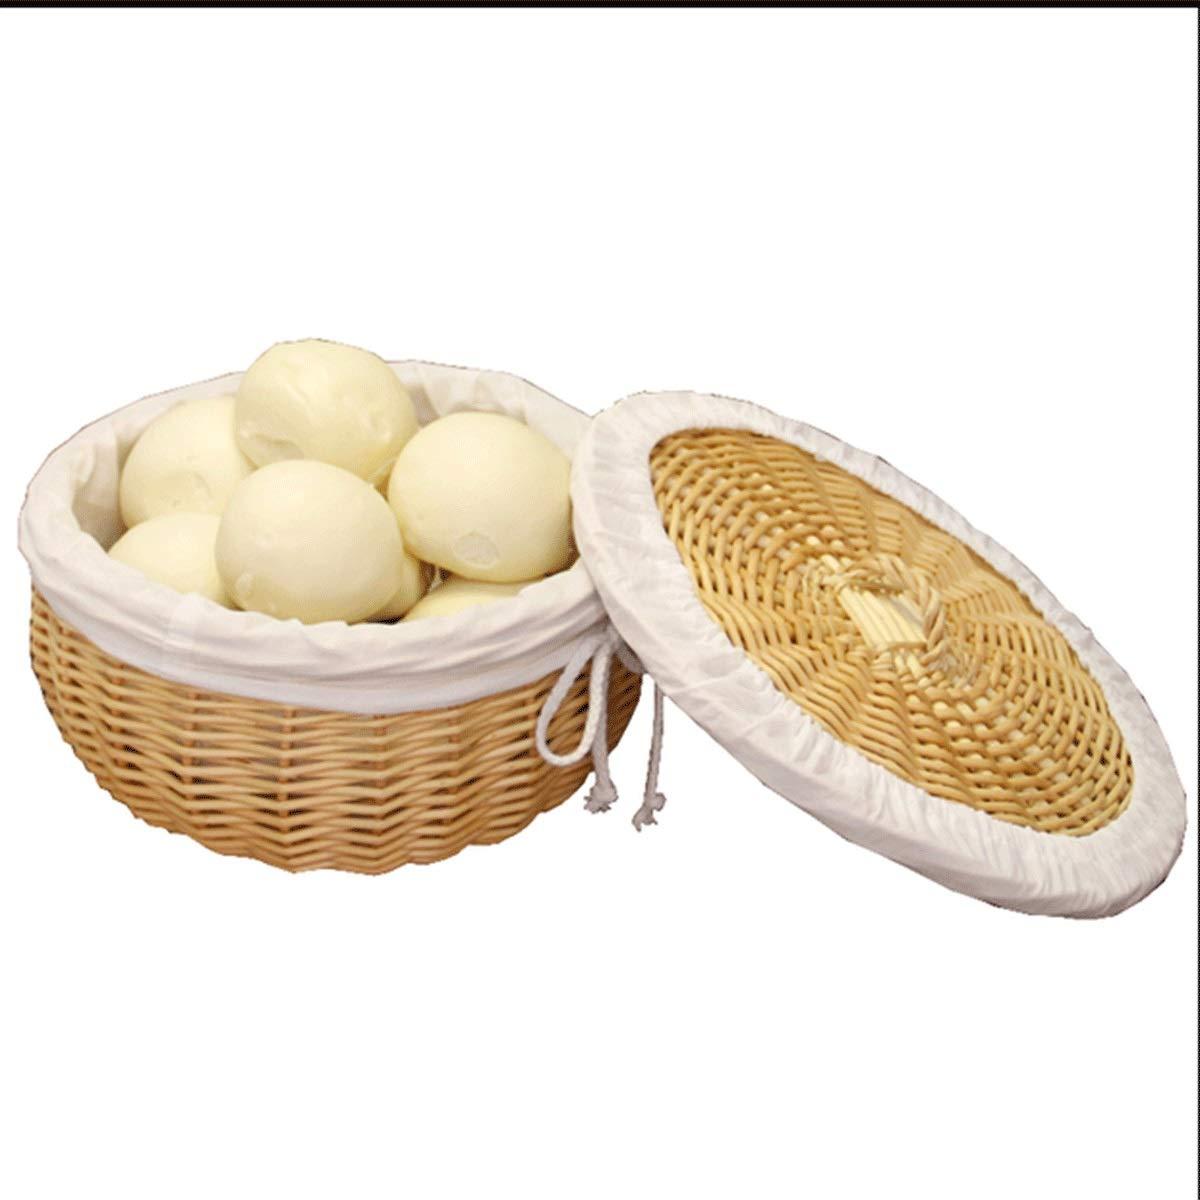 Muziwenju Bread Basket, Rattan Basket, Insulated Wicker Bread Basket with Lid, Family Restaurant Woven Egg Basket, Vegetable Basket, Round (Size : M)